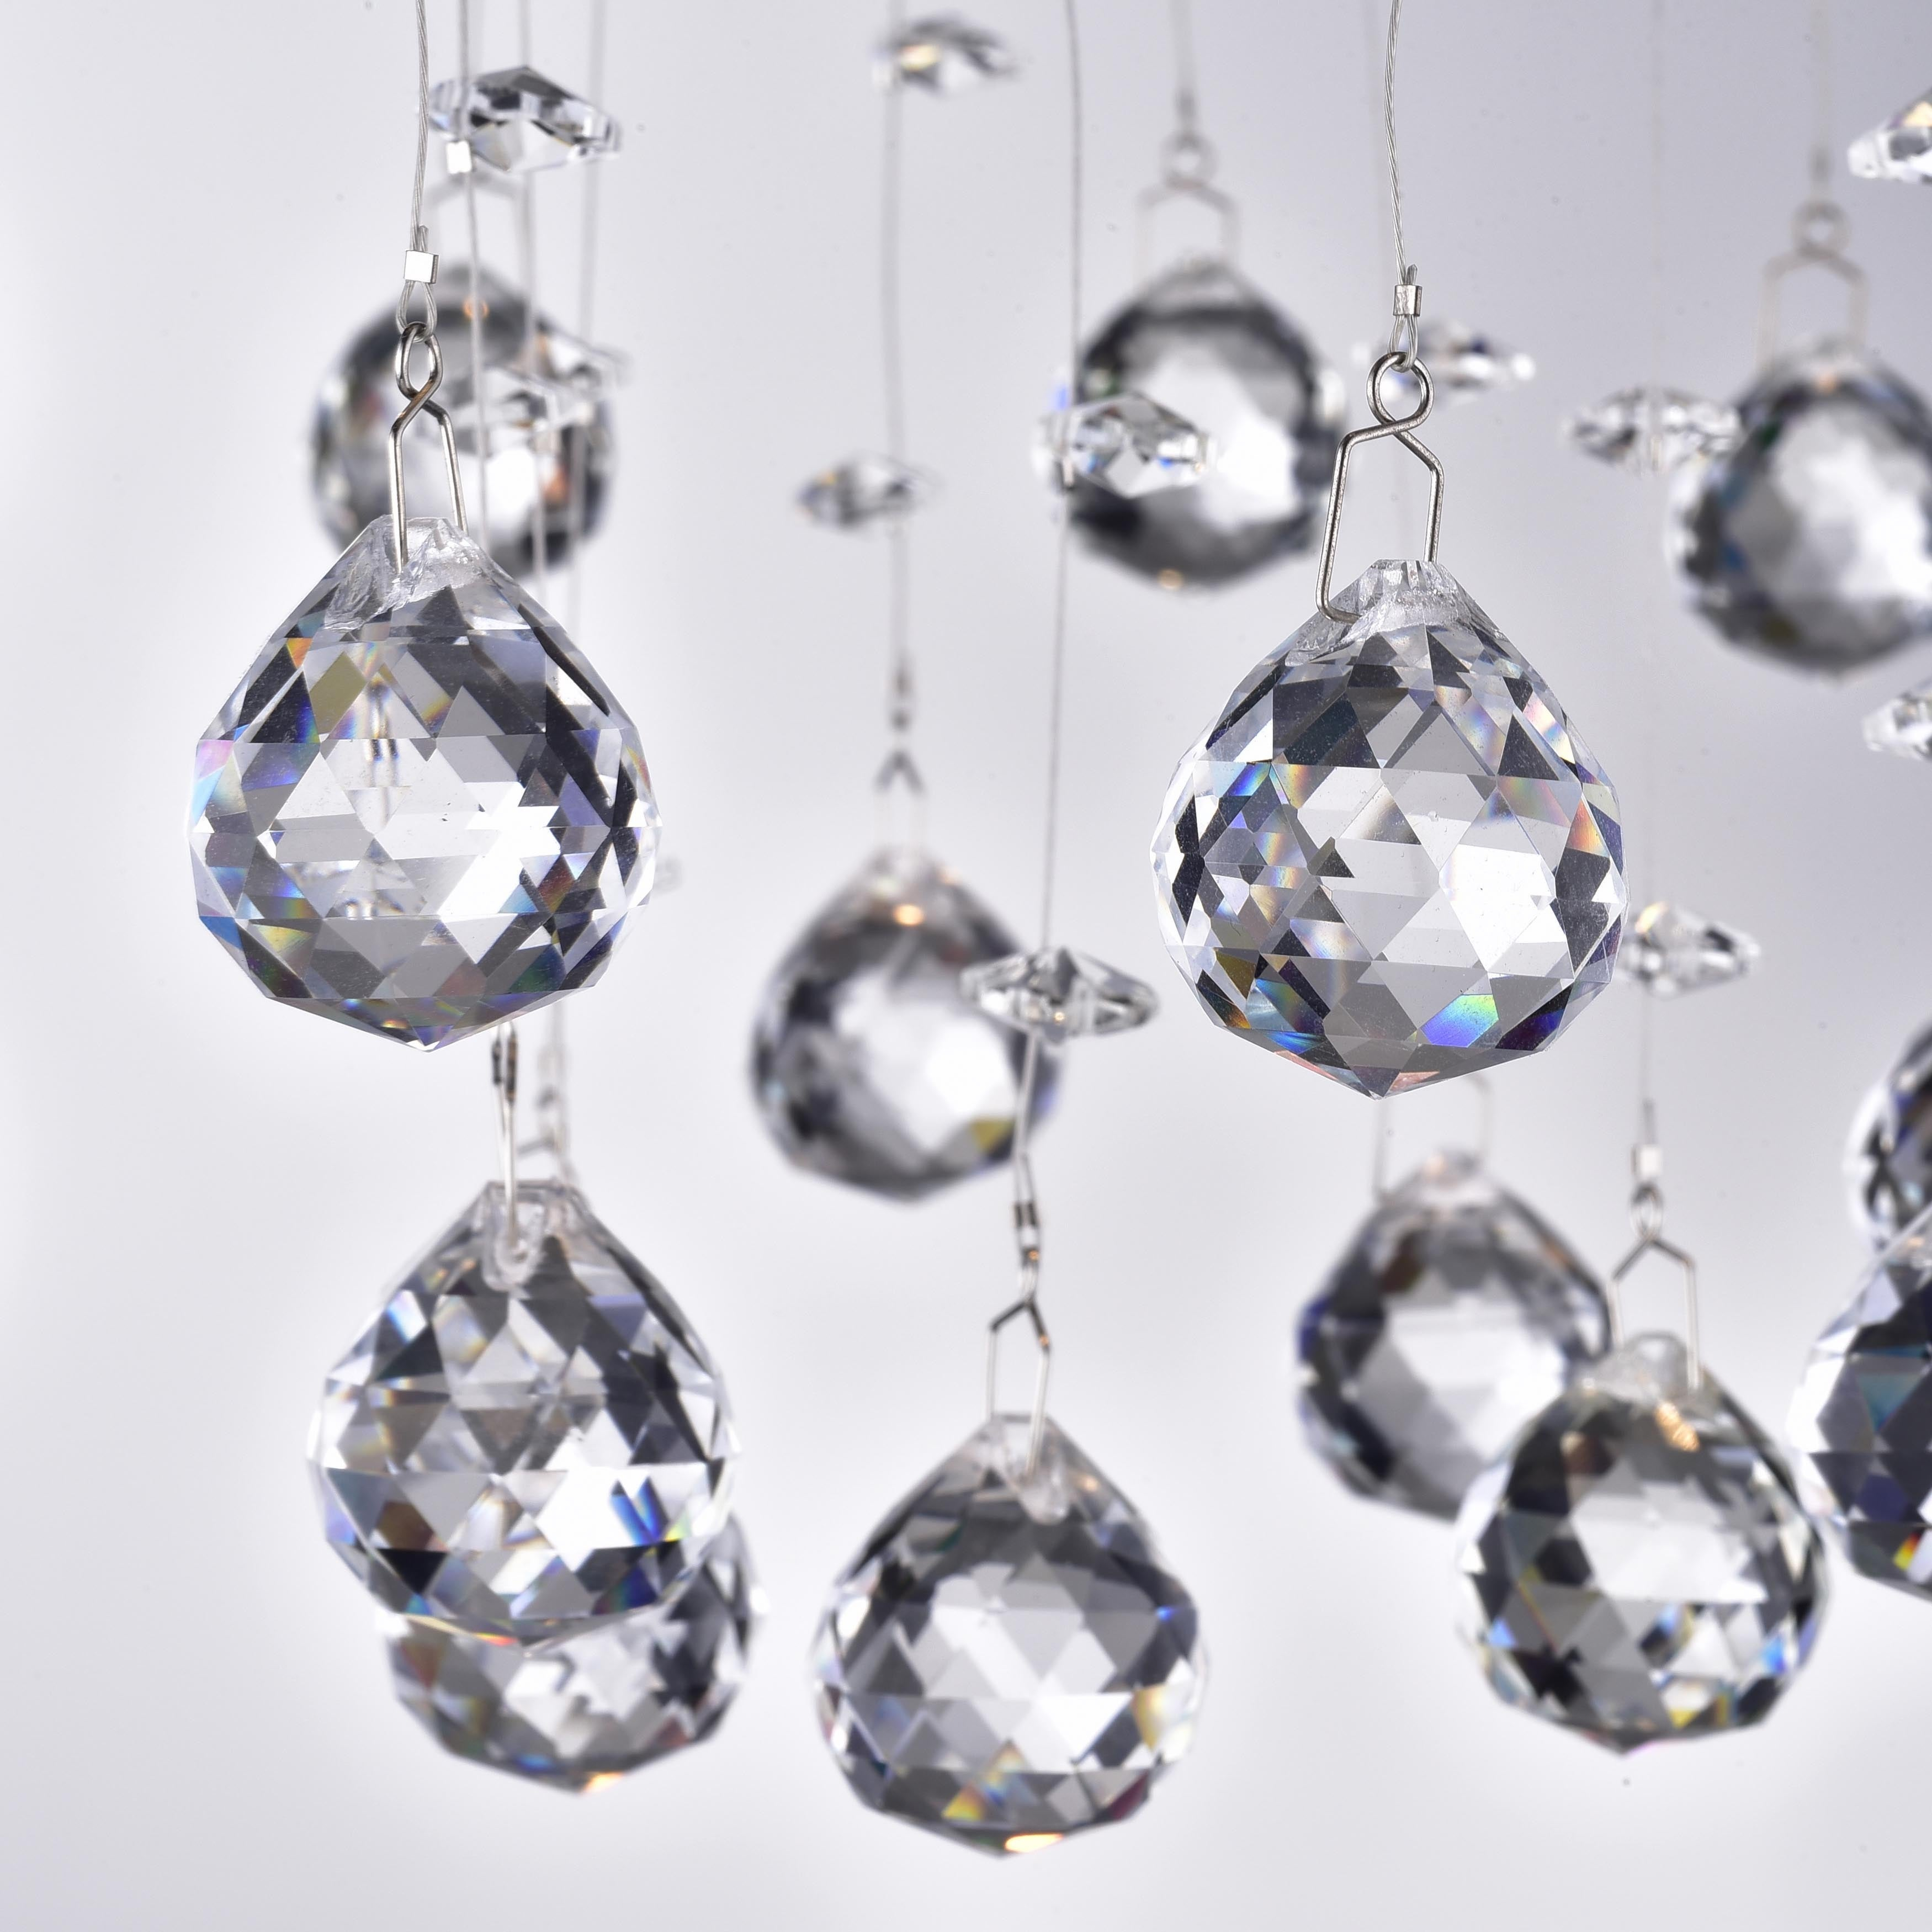 Floating bubble chrome and white 5 light crystal chandelier free floating bubble chrome and white 5 light crystal chandelier free shipping today overstock 13605676 aloadofball Images